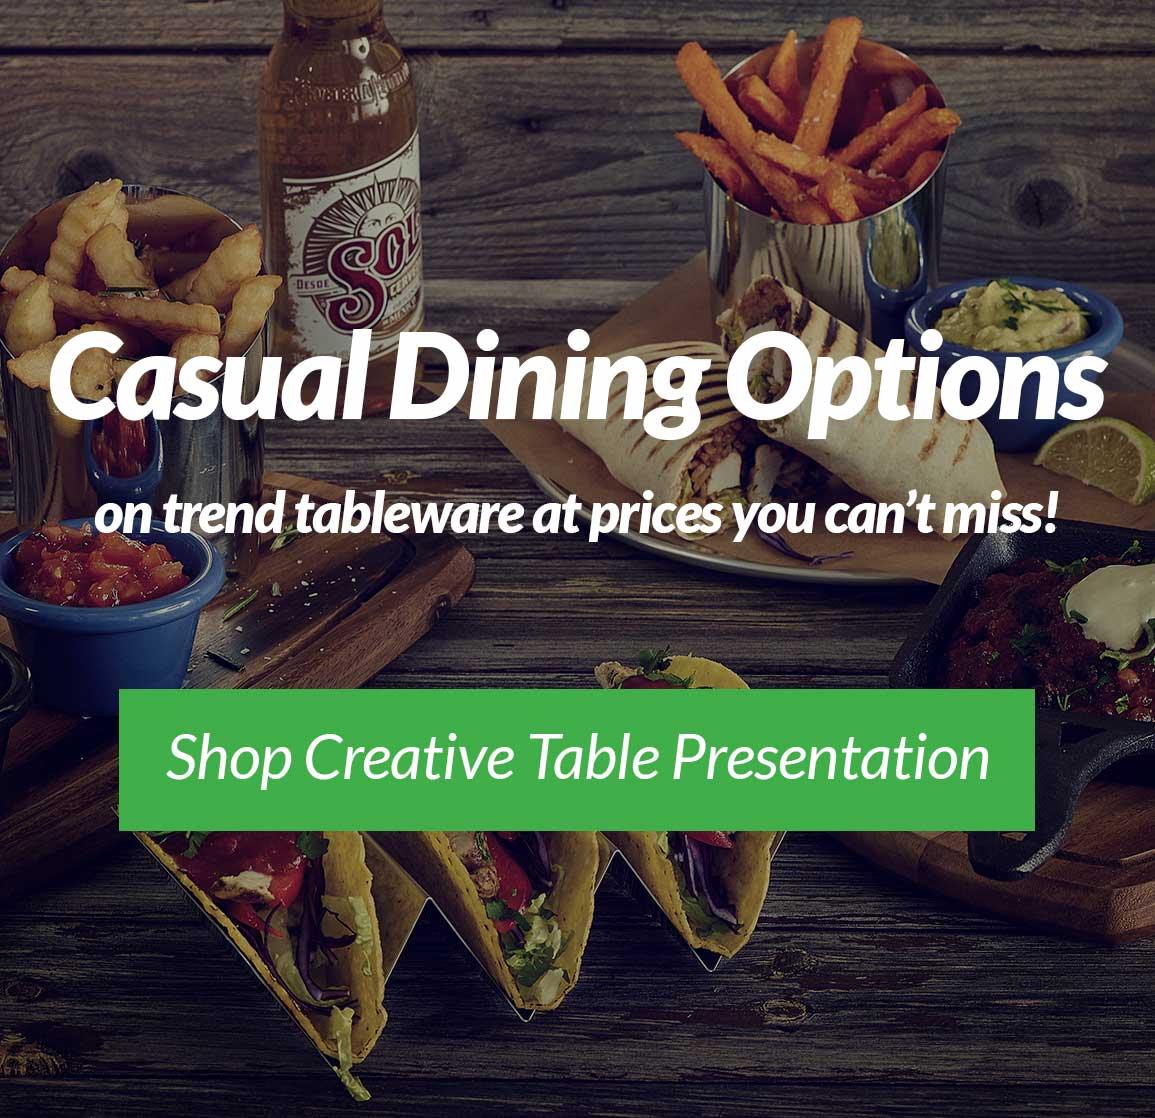 Creative Table Presentation